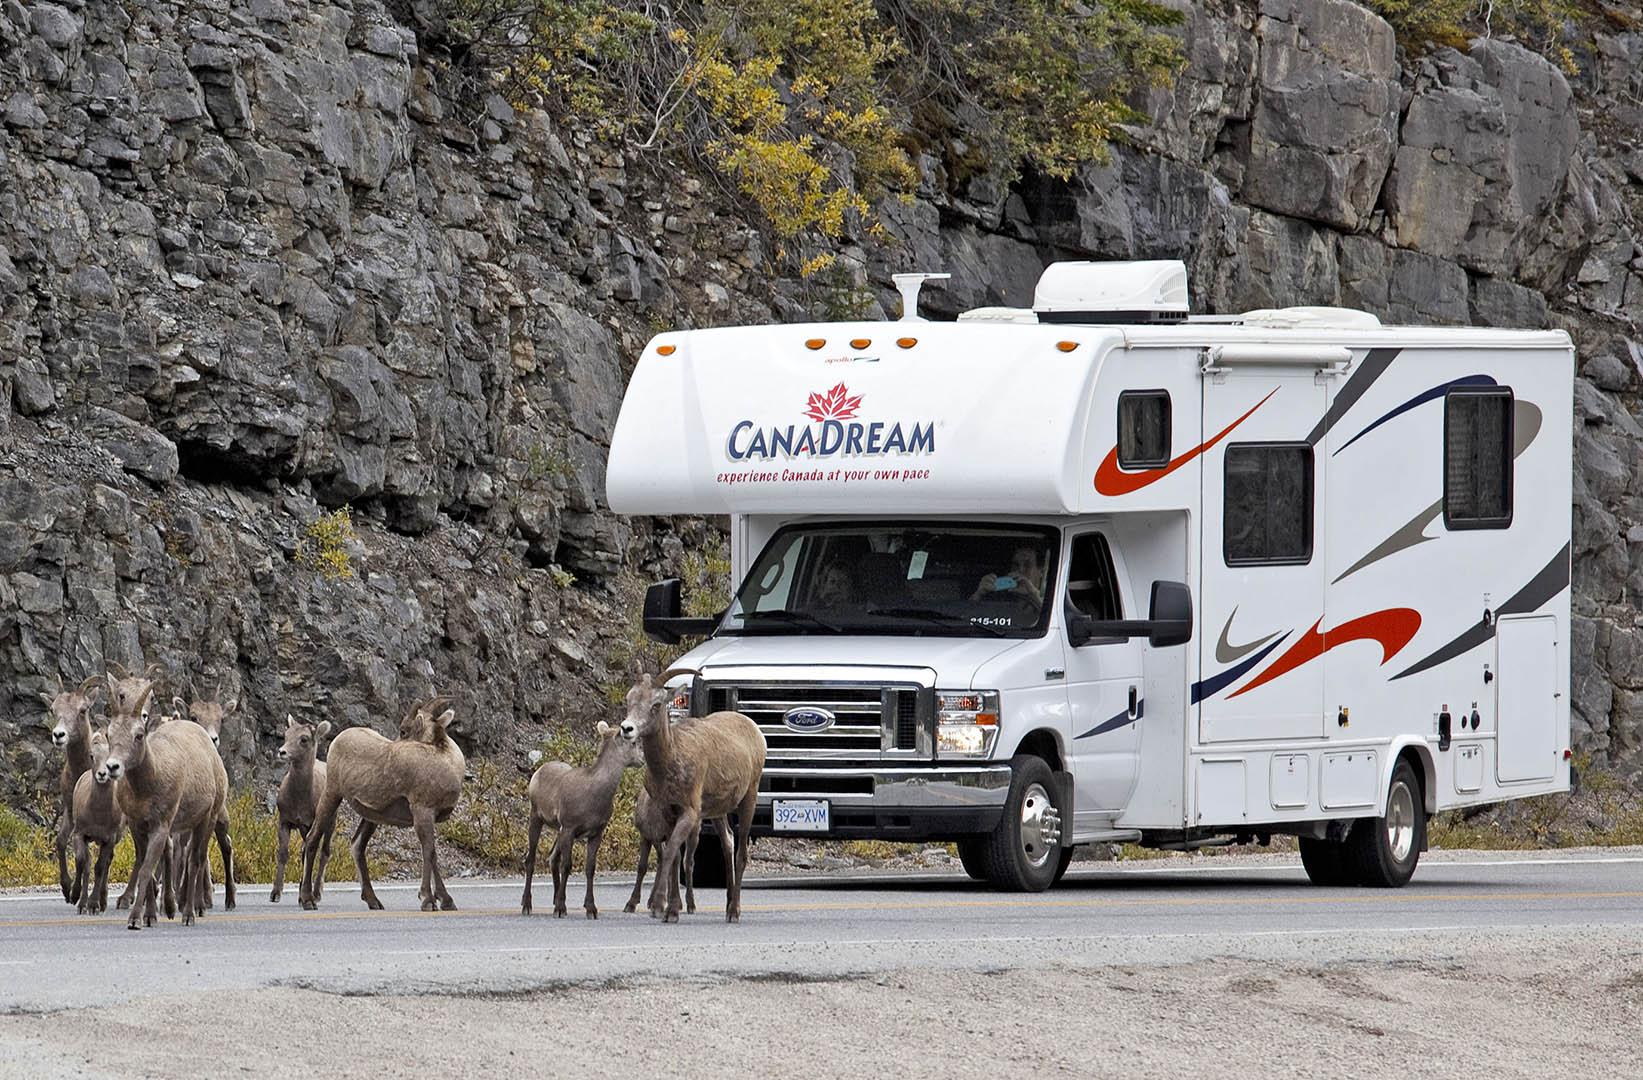 Traffic Jam in the Rockies